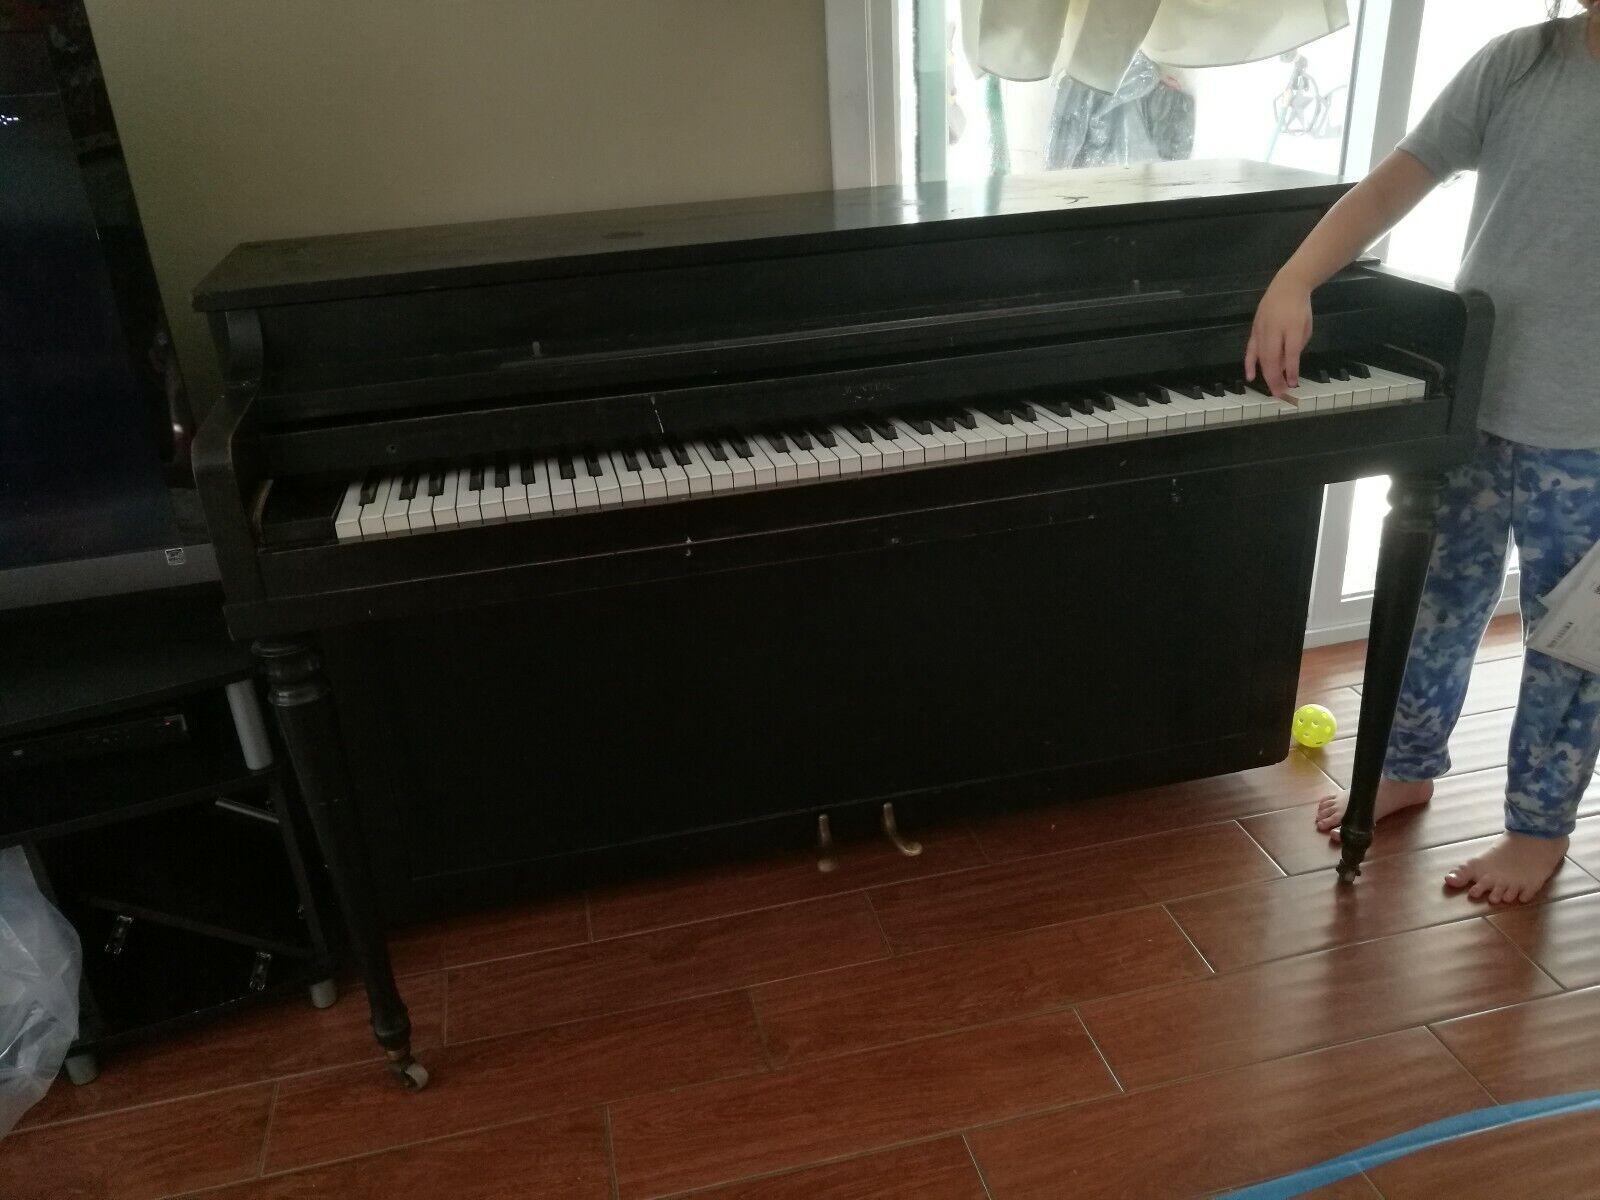 schwarz Winter Piano Spinet 1 Key Stuck